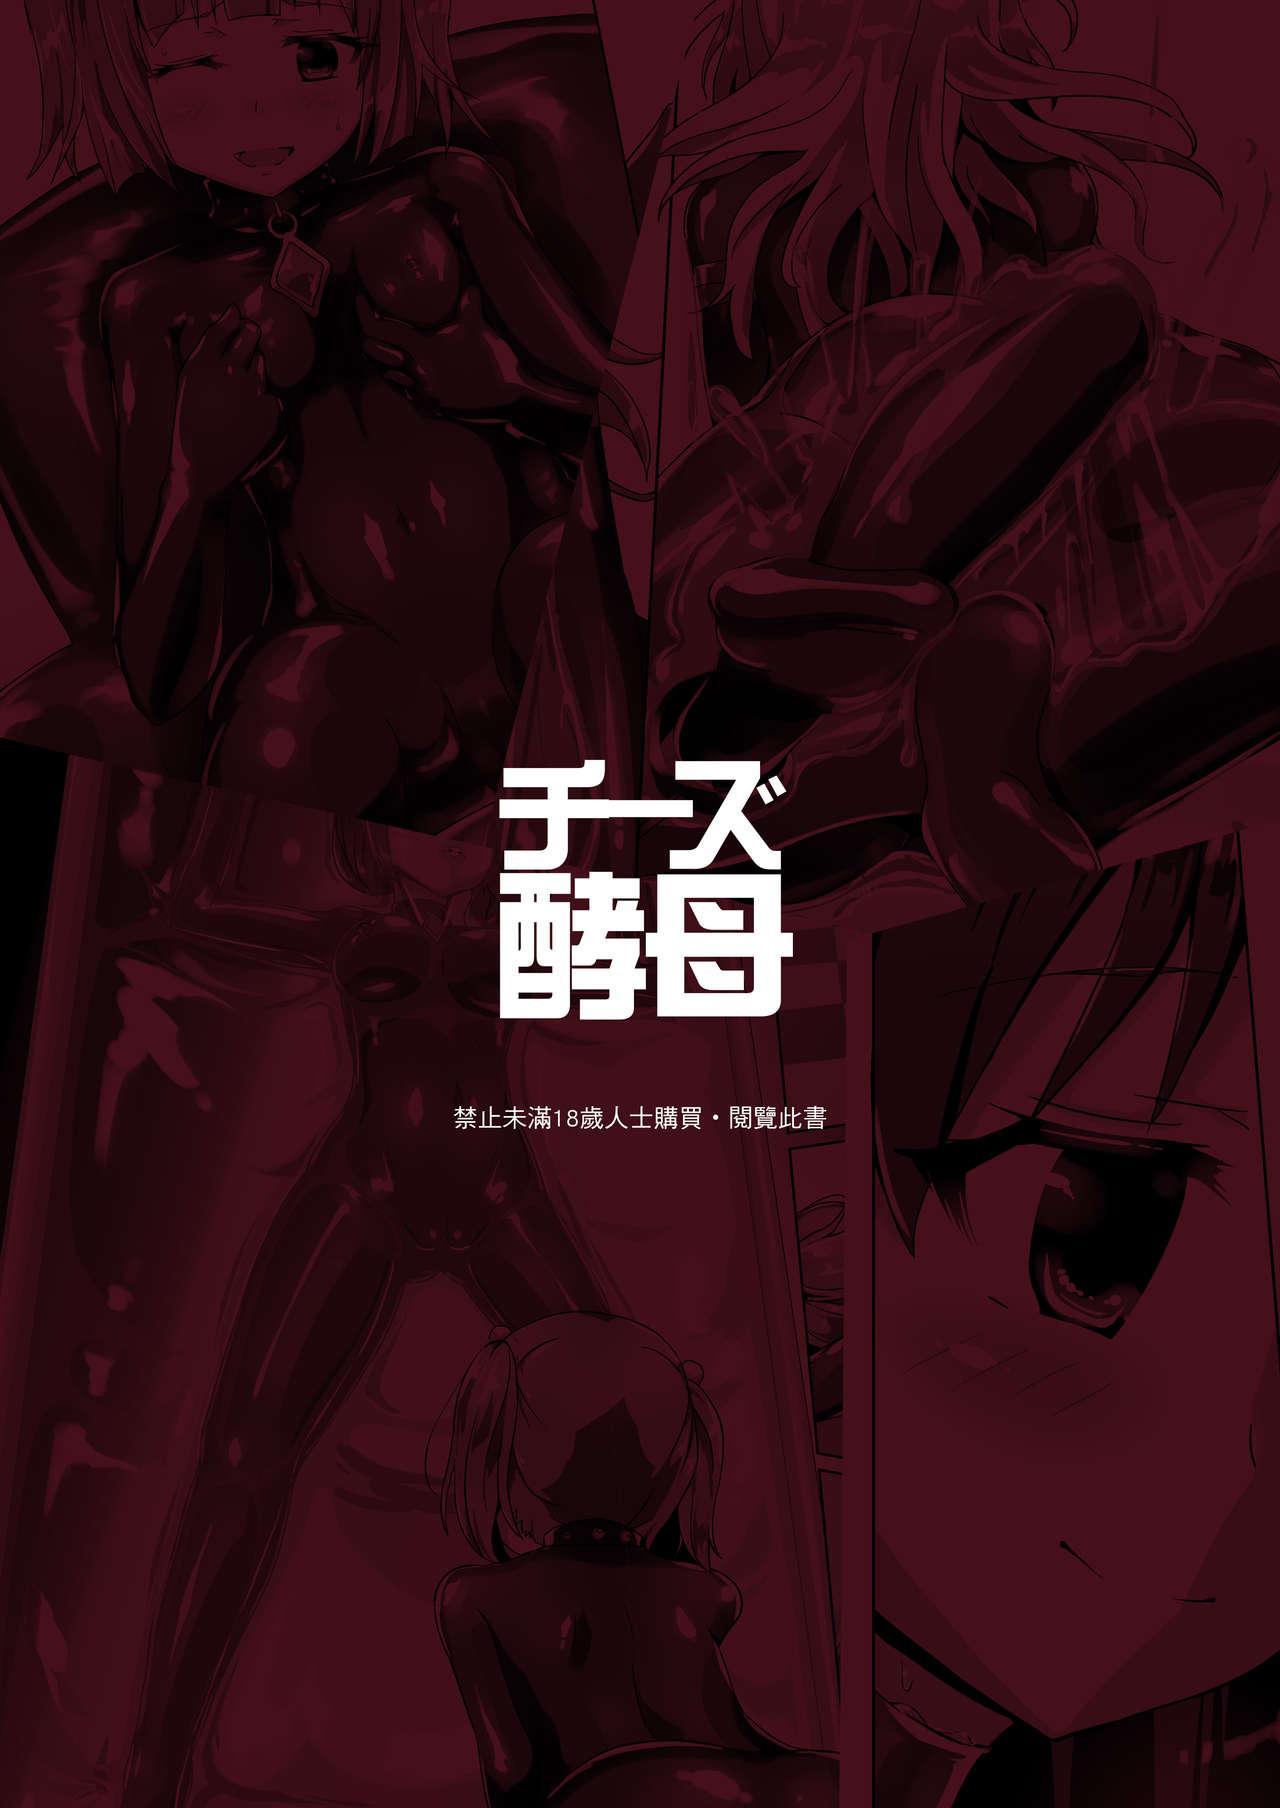 Yumewatari no Mistress Night 2 | 穿梭夢境的女王陛下 night 2 39